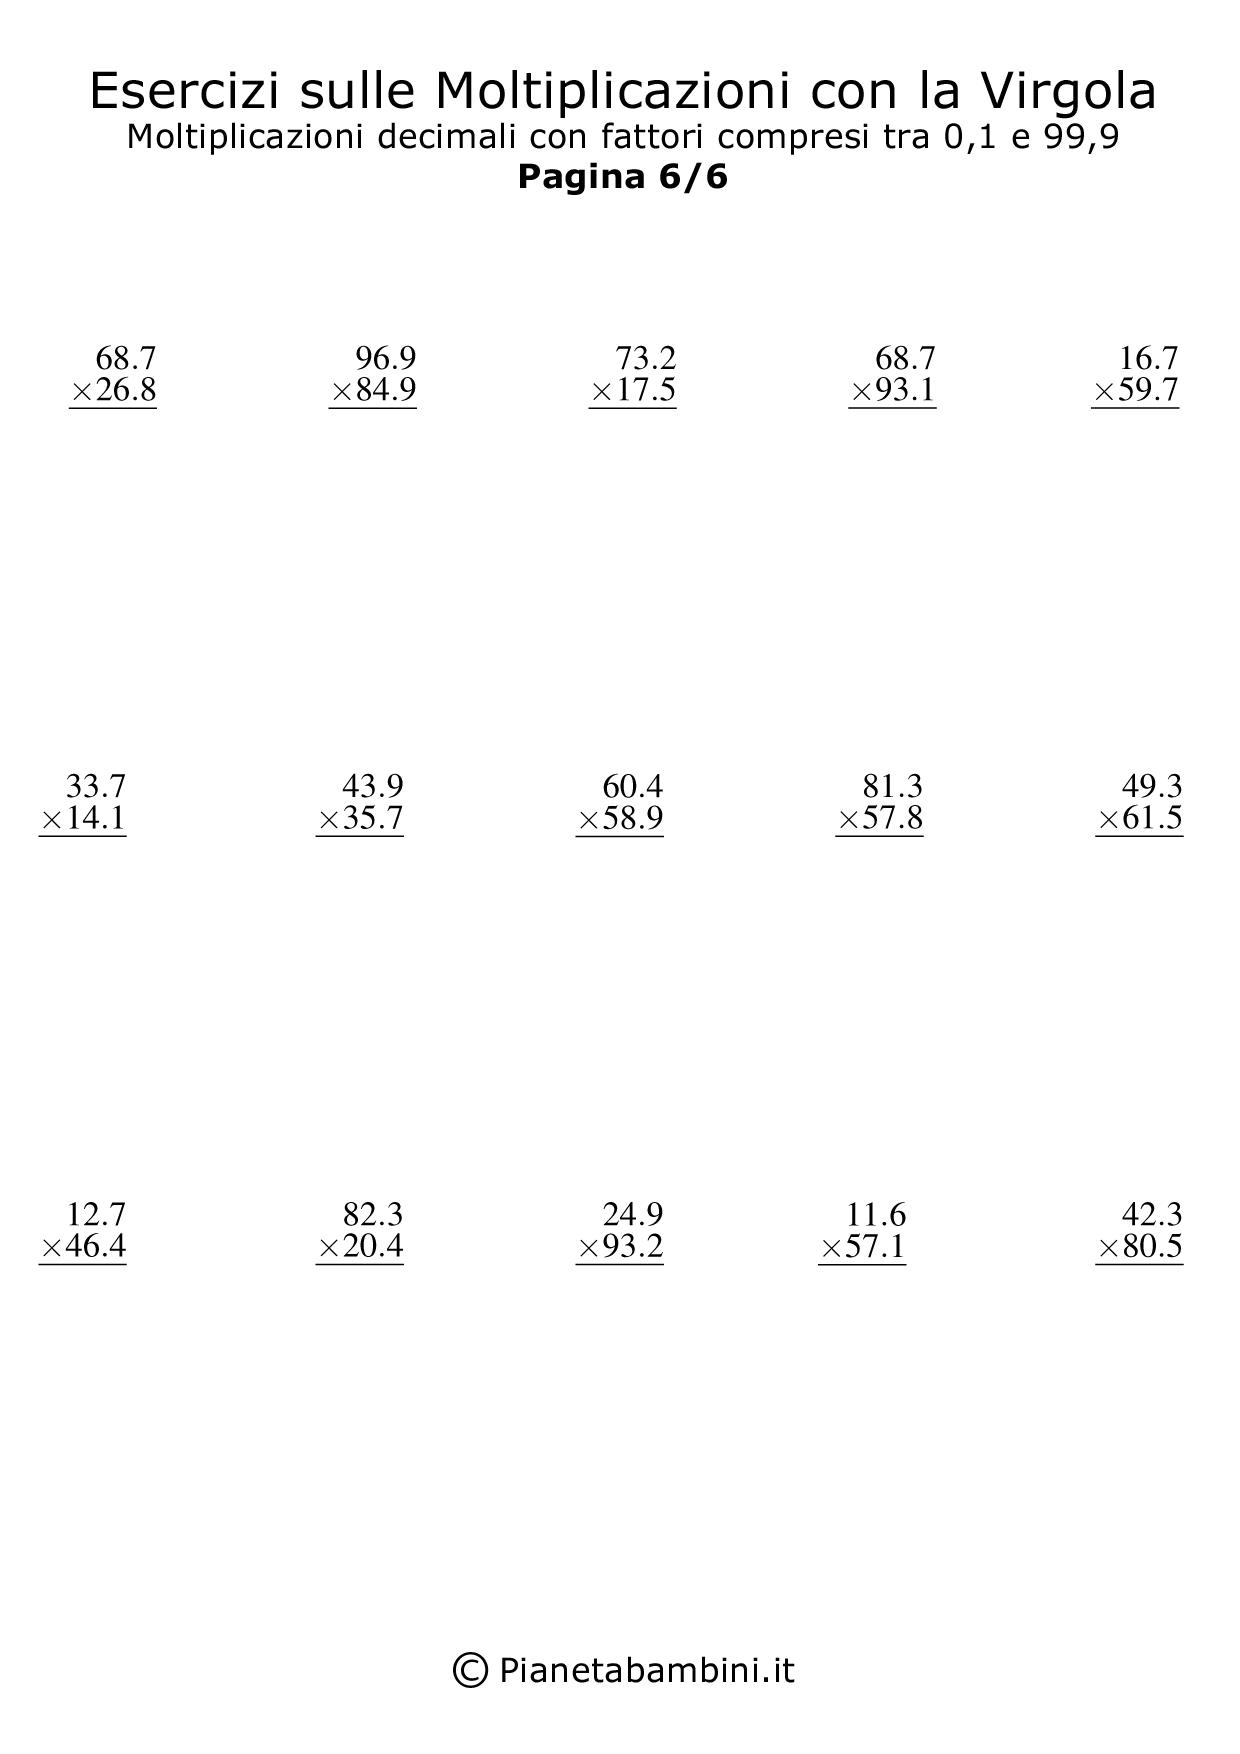 Moltiplicazioni-Virgola-0.1-99.9_6